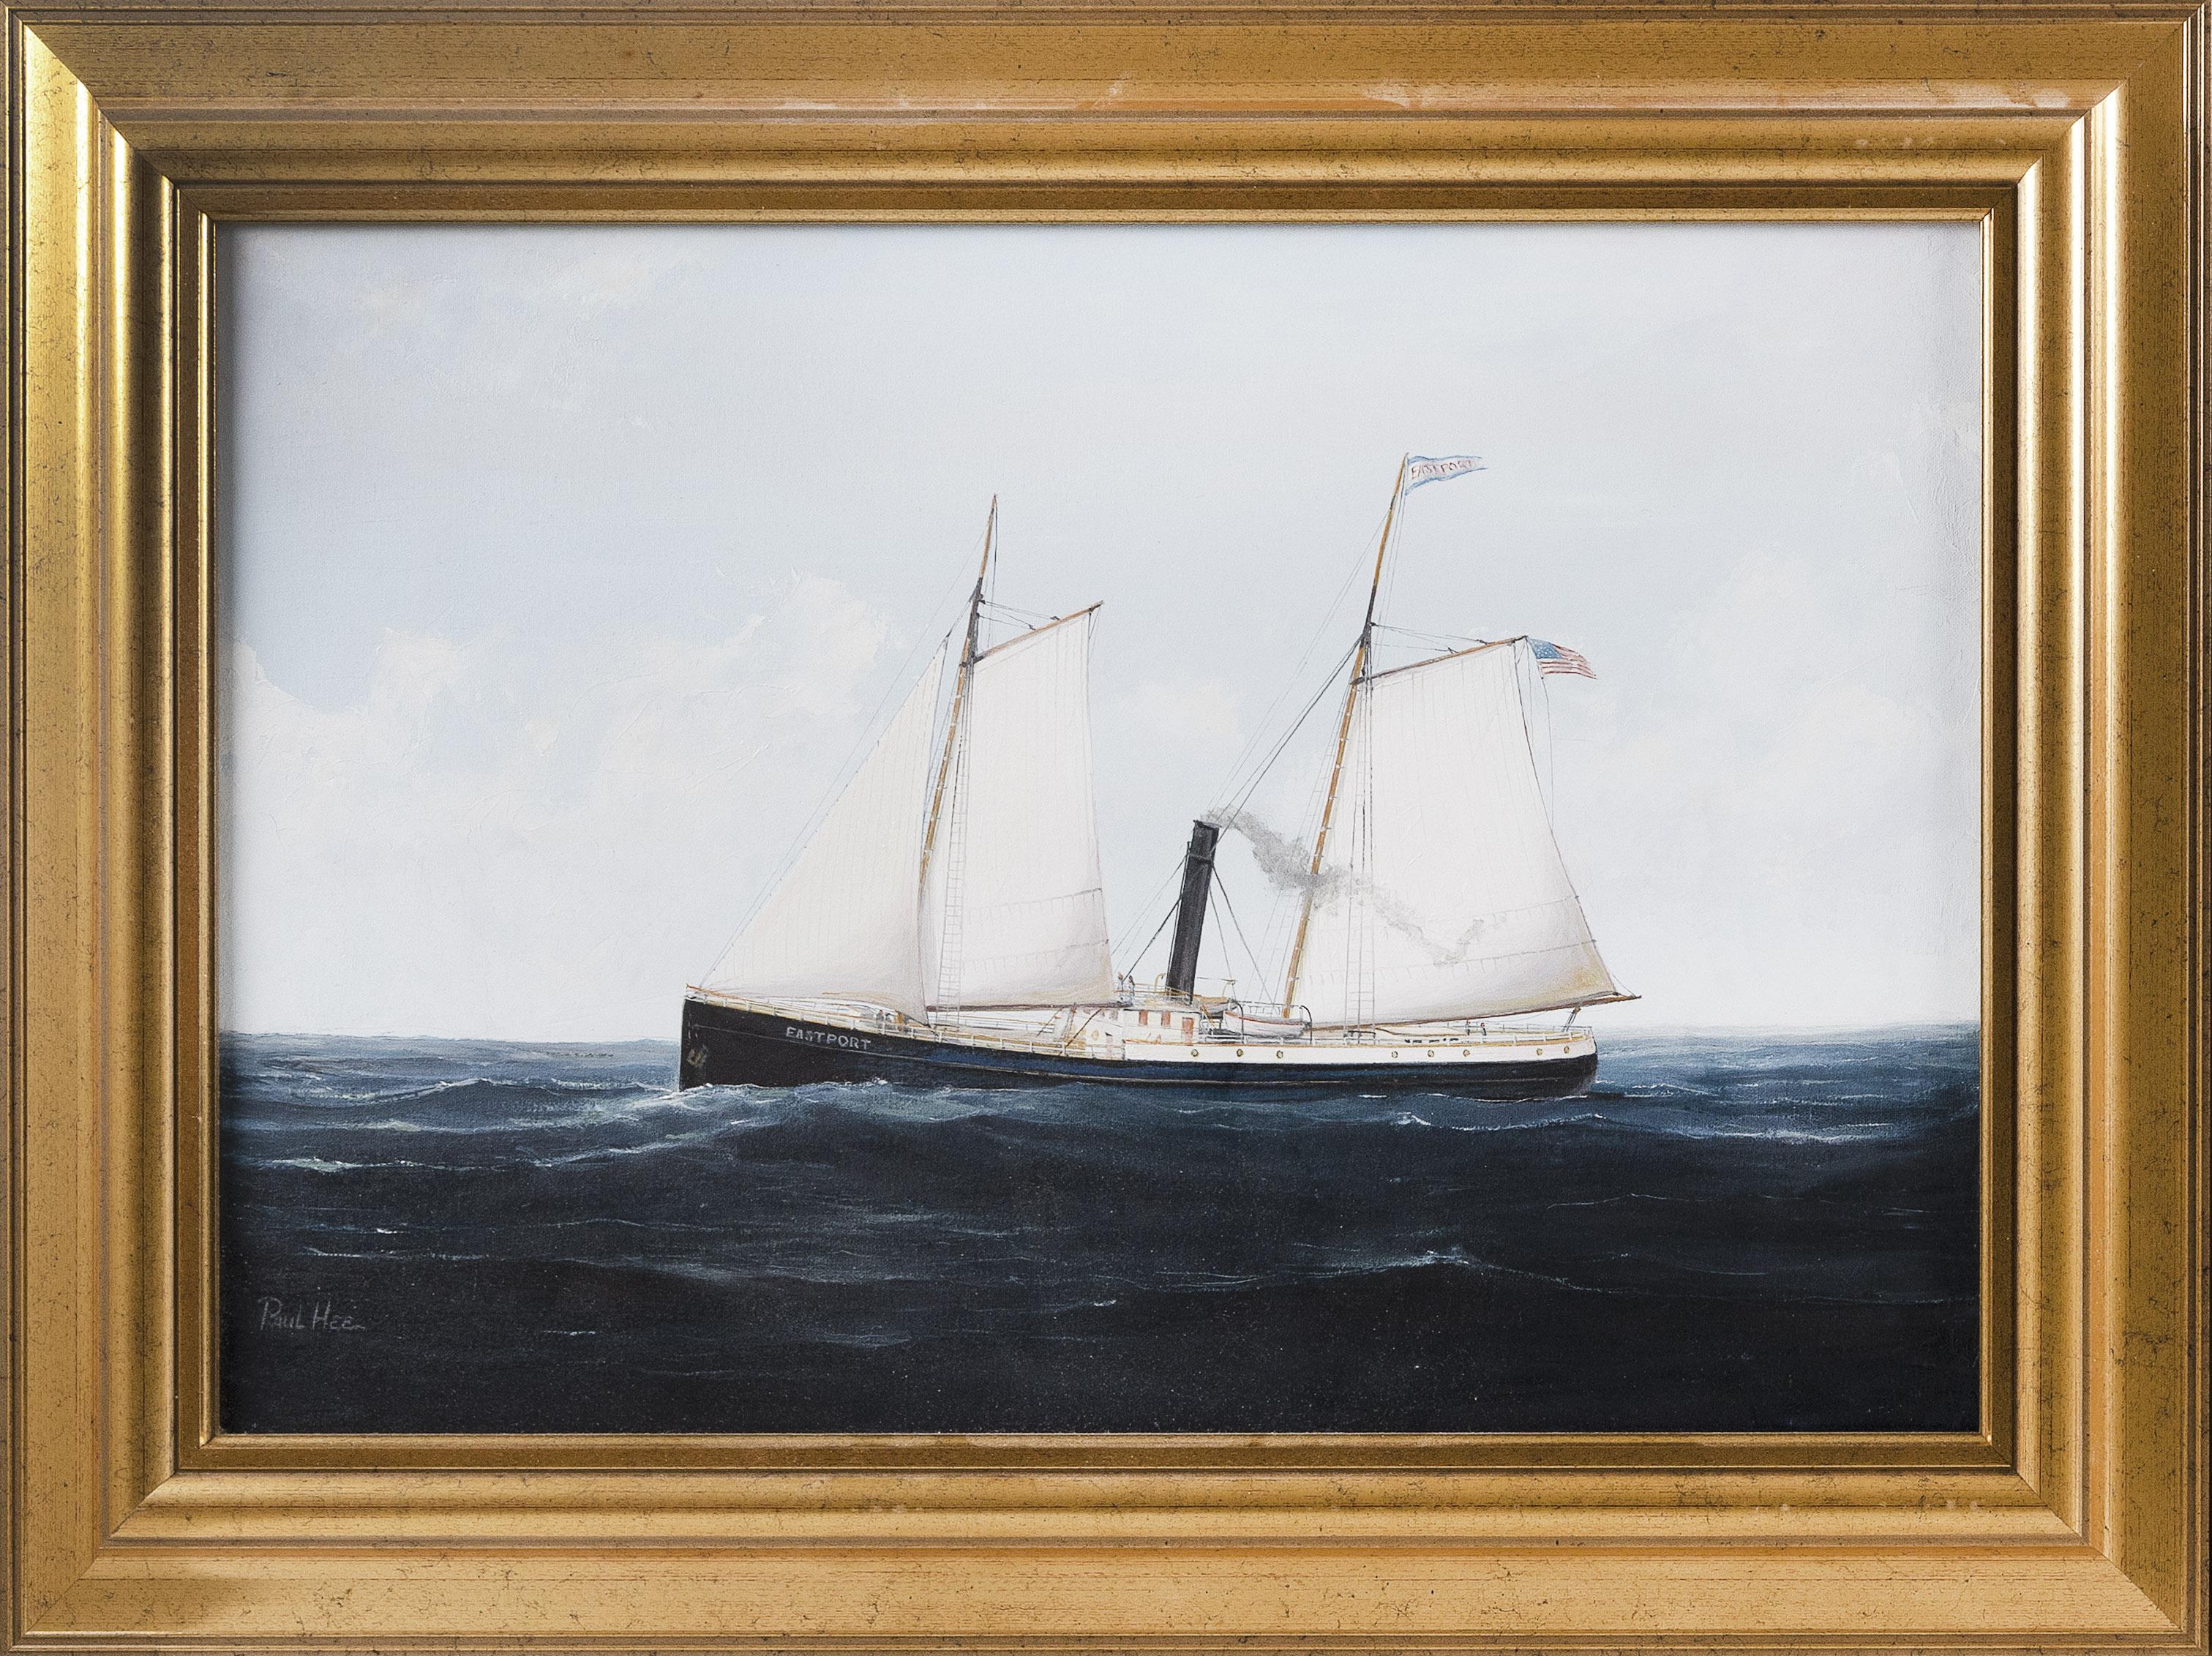 PAUL R. HEE (North Carolina, d. 2011), Portrait of a steam-sail ship., Oil on canvas, 18